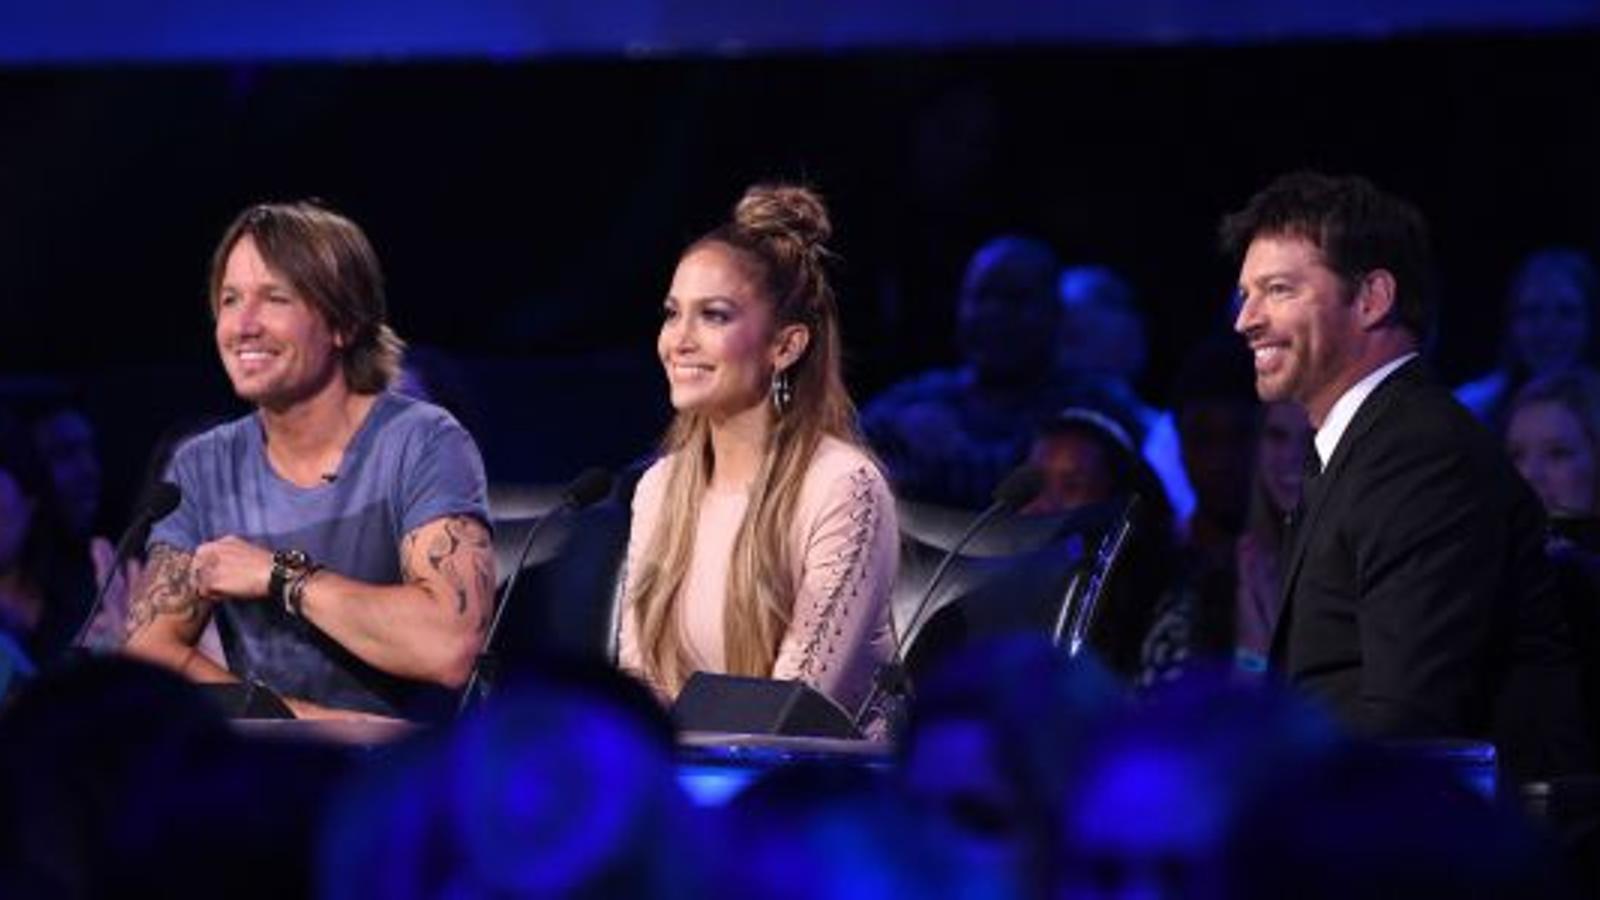 Els jutges d''American Idol' Keith Urban, Jennifer López i Harry Connick Jr.